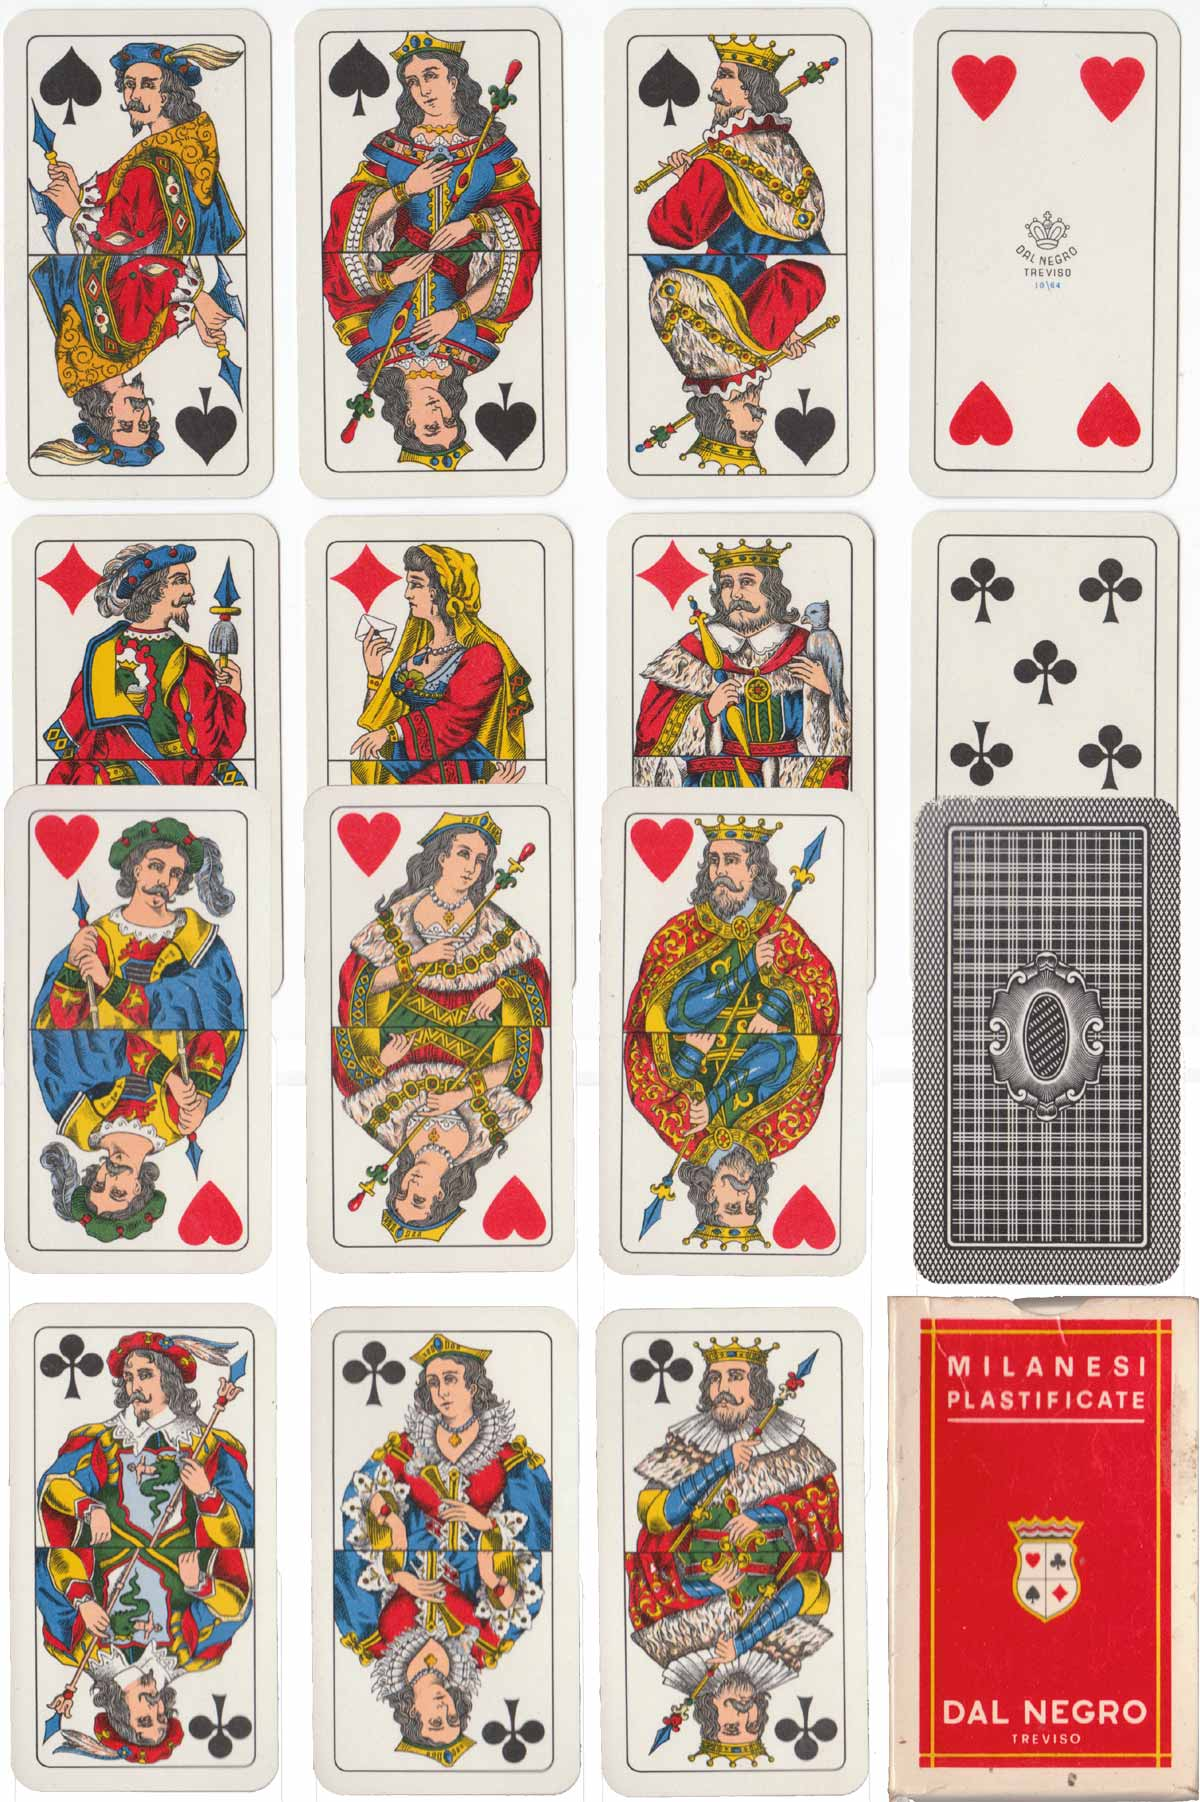 Milanesi pattern by Dal Negro